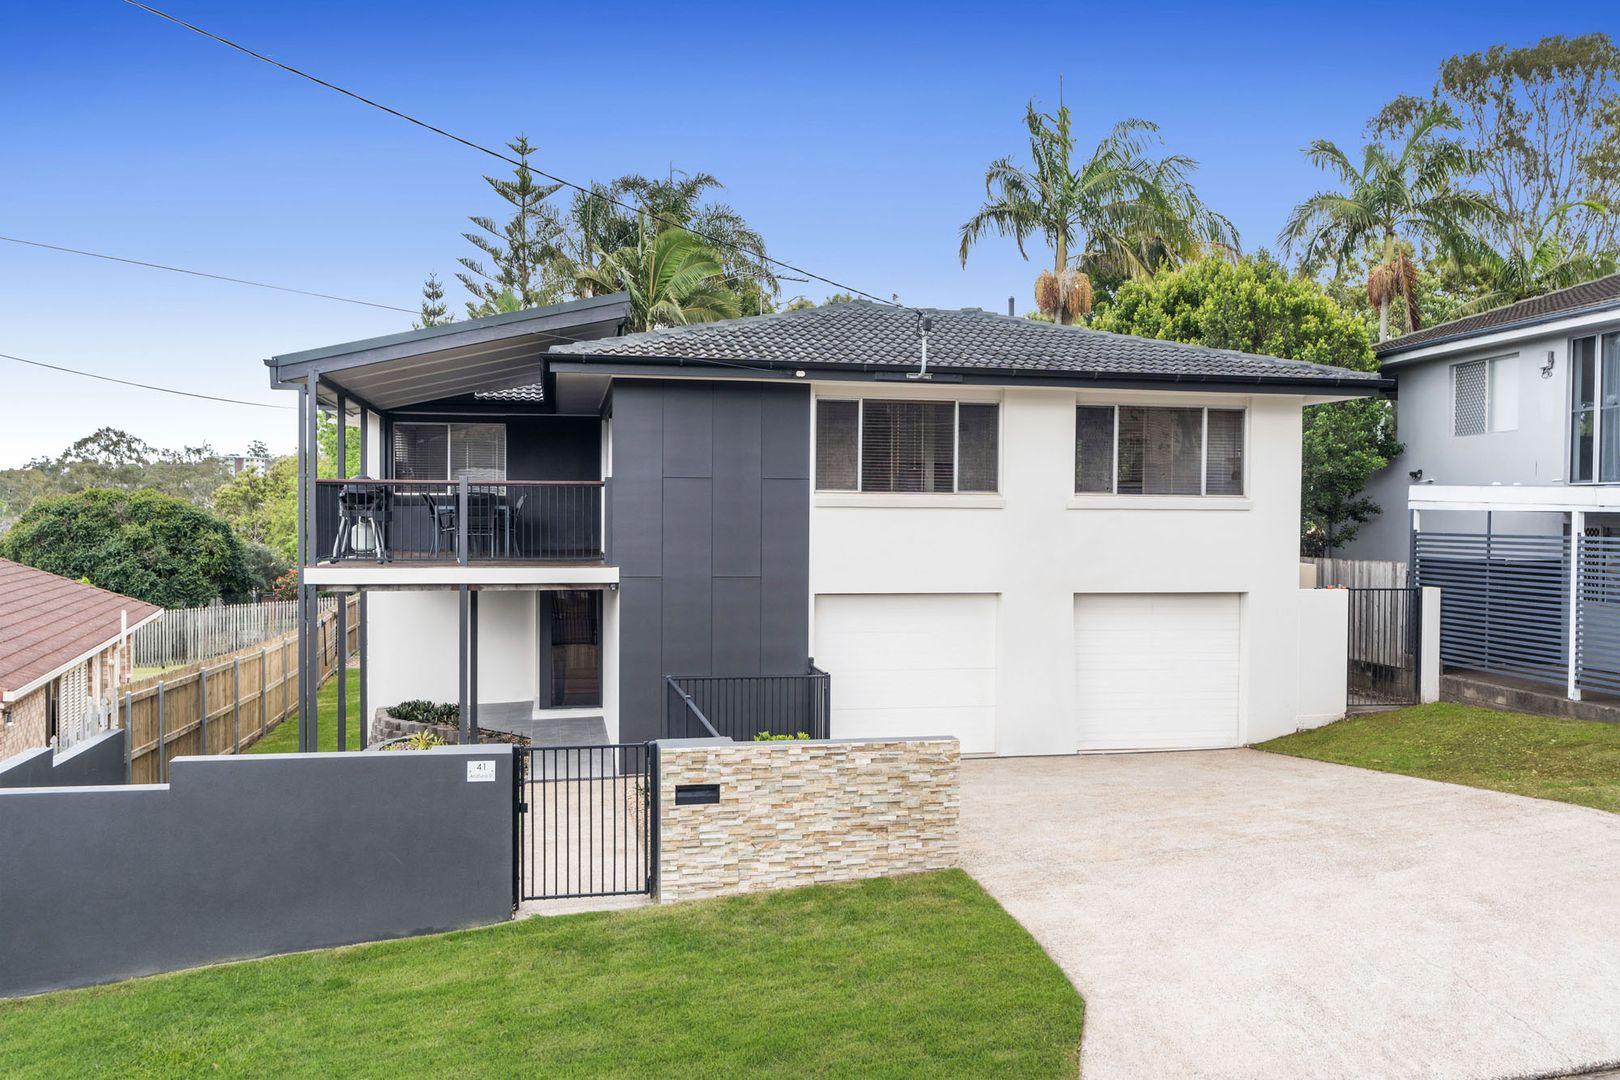 41 Arafura Street, Upper Mount Gravatt QLD 4122, Image 0